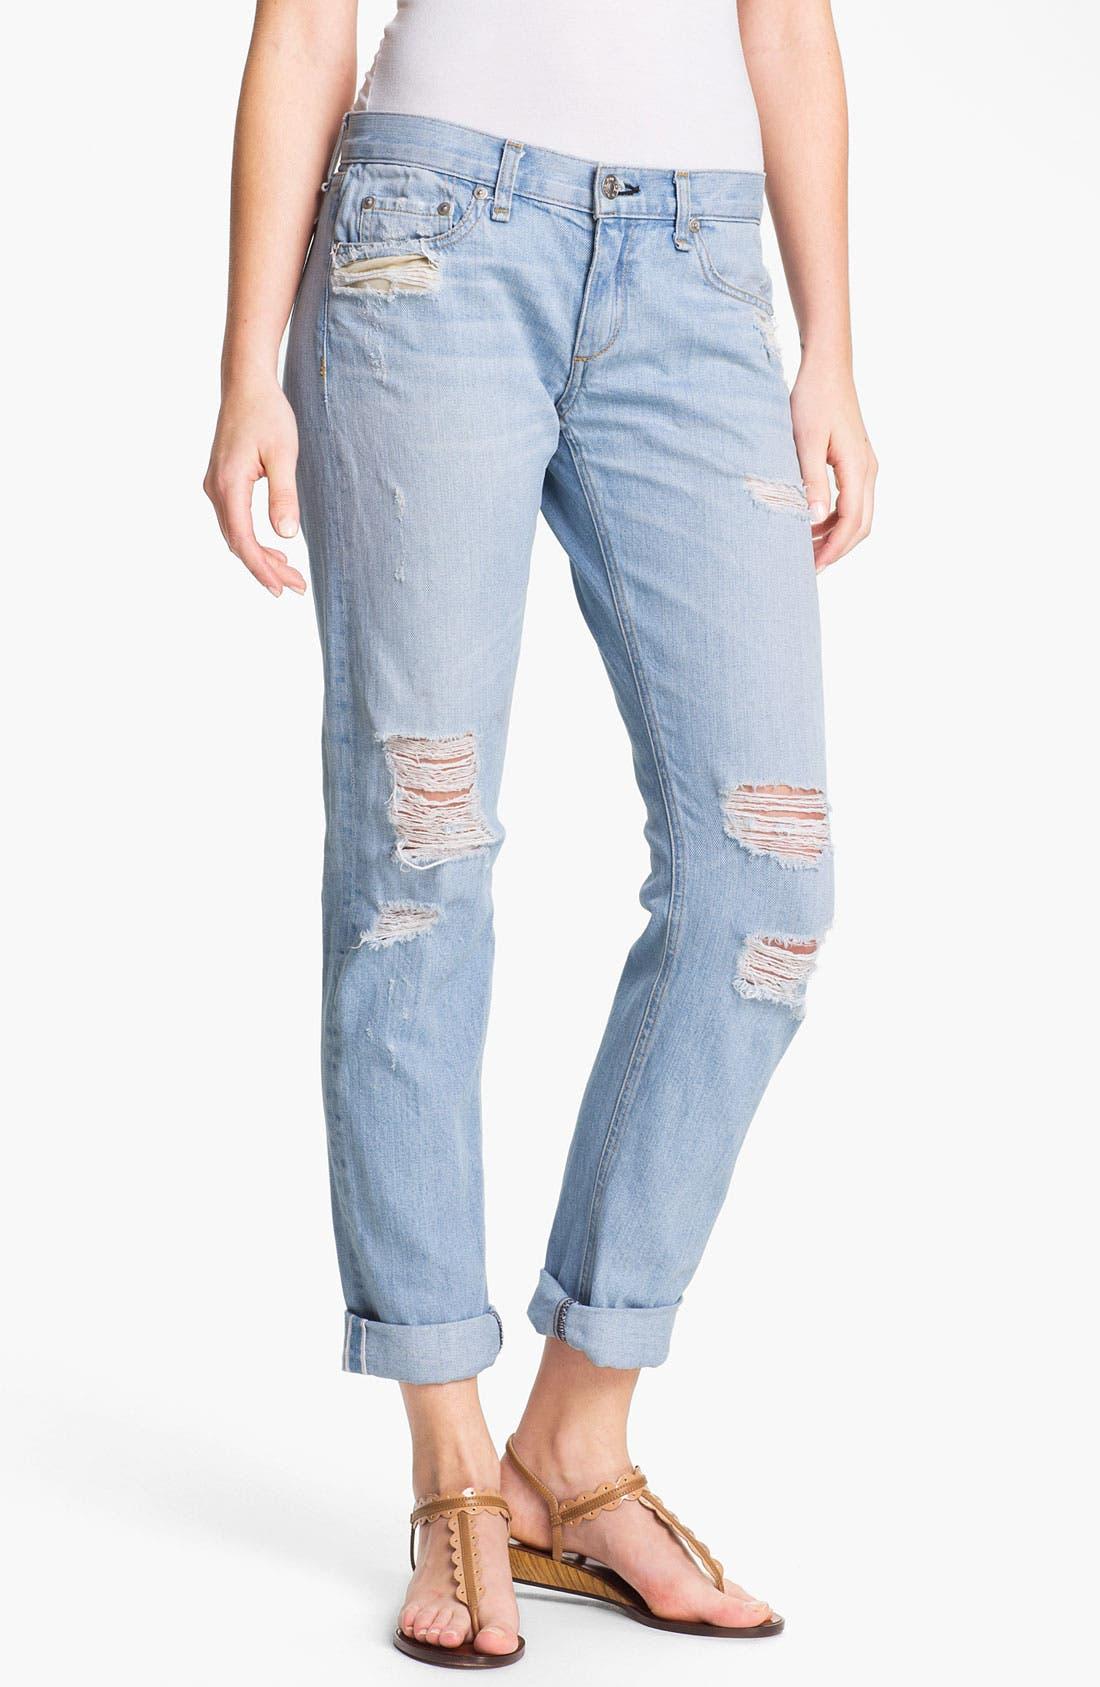 Alternate Image 1 Selected - rag & bone/JEAN 'The Boyfriend' Selvedge Denim Jeans